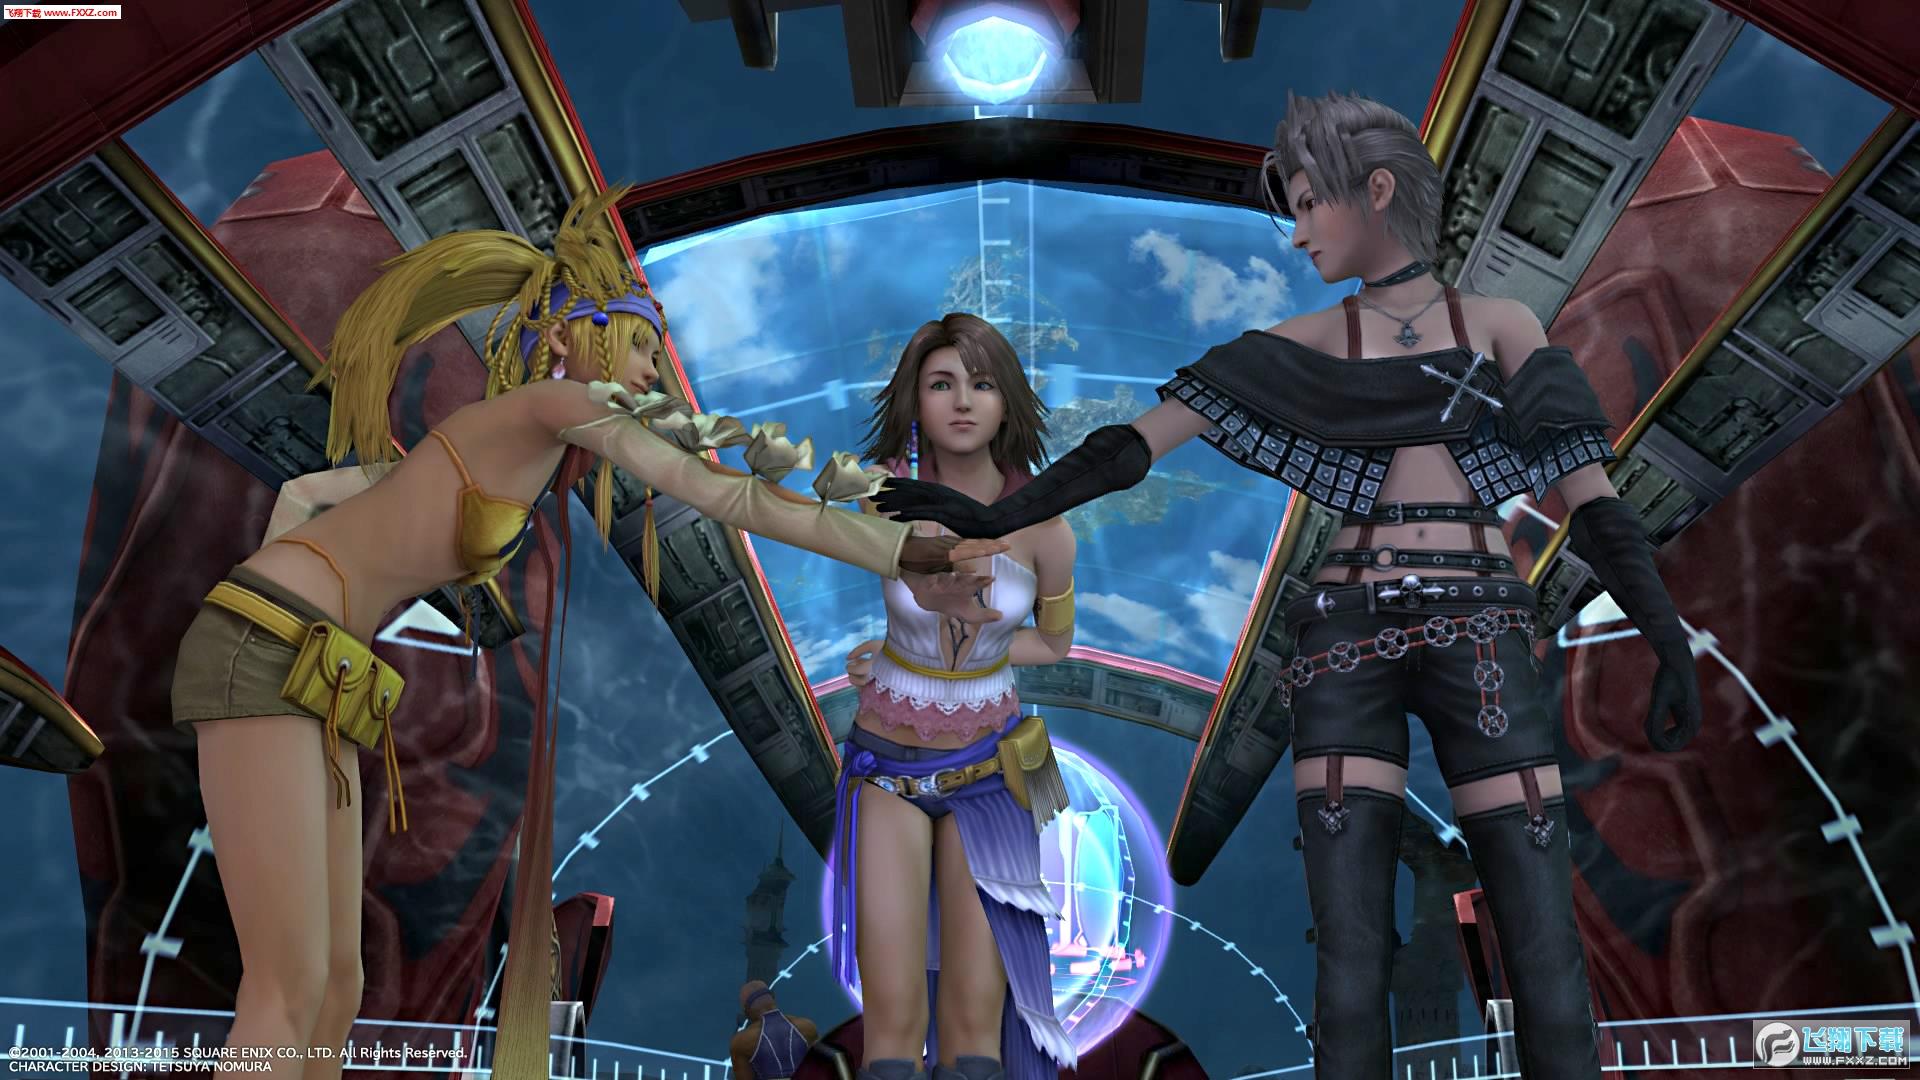 最终幻想10/10-2高清重制版(FINAL FANTASY X/X-2 HD Remaster)截图3